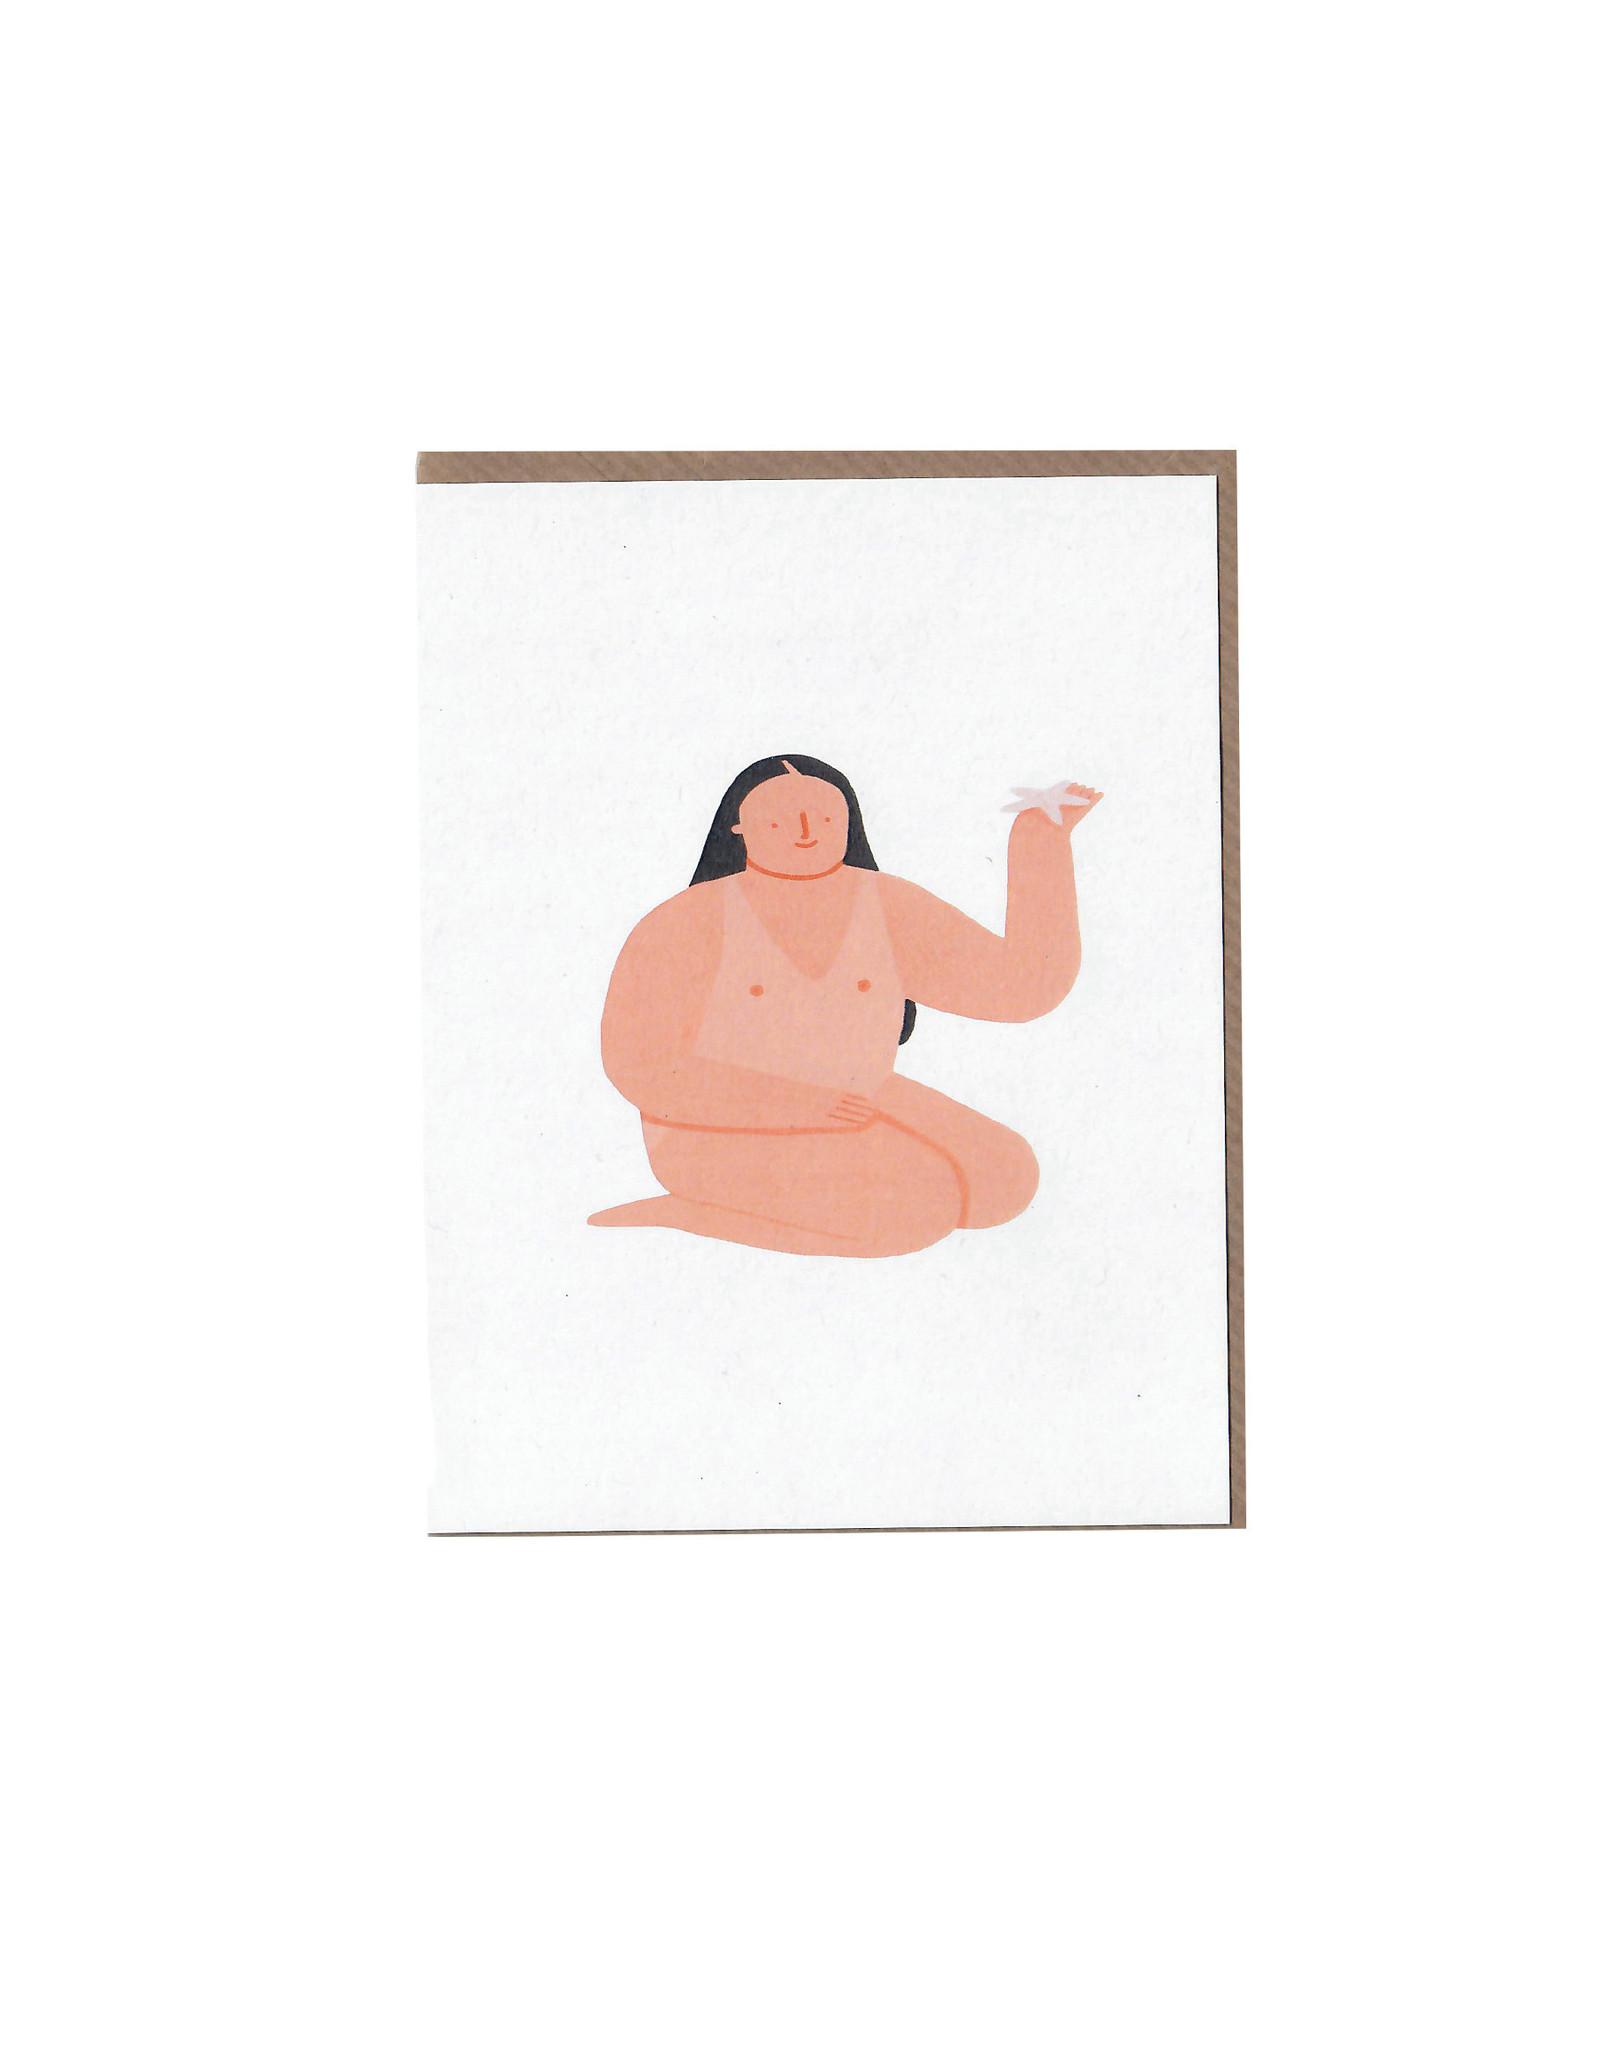 Eleonora Arosio Card, Bather Star Fish